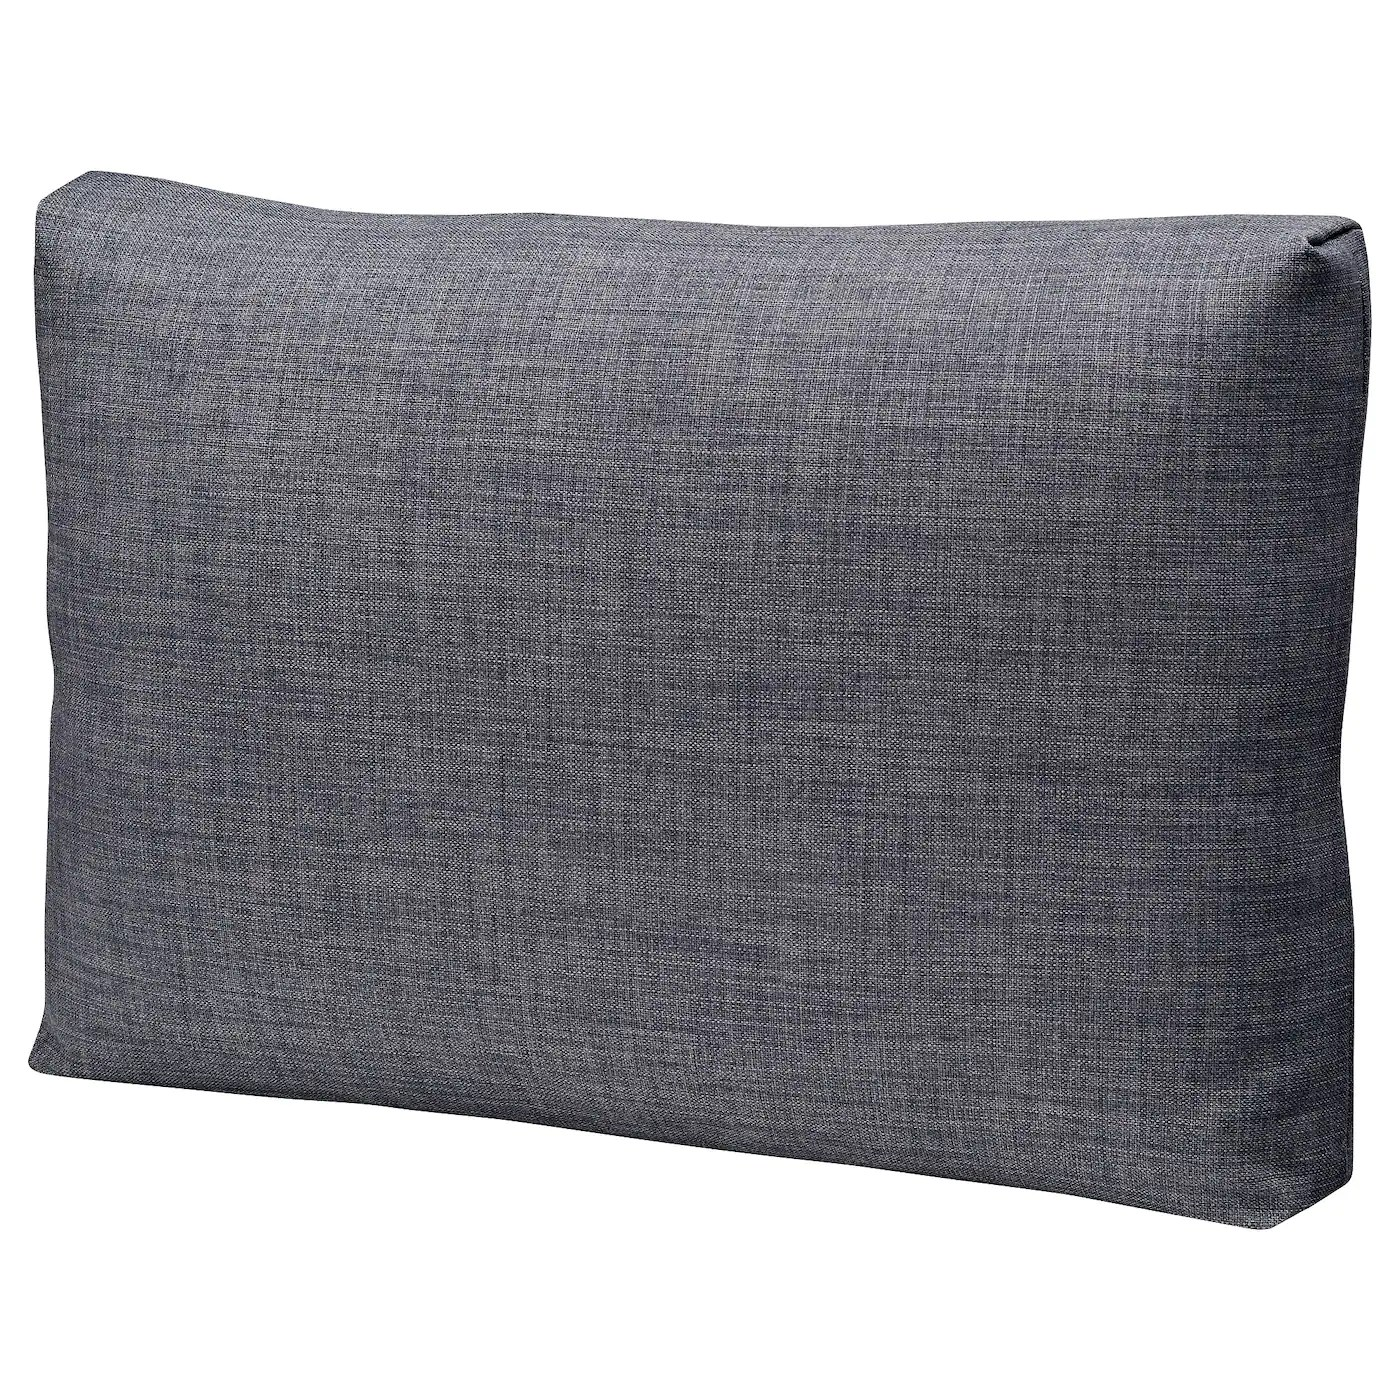 corner sofa bed skiftebo dark grey with removable washable covers friheten storage